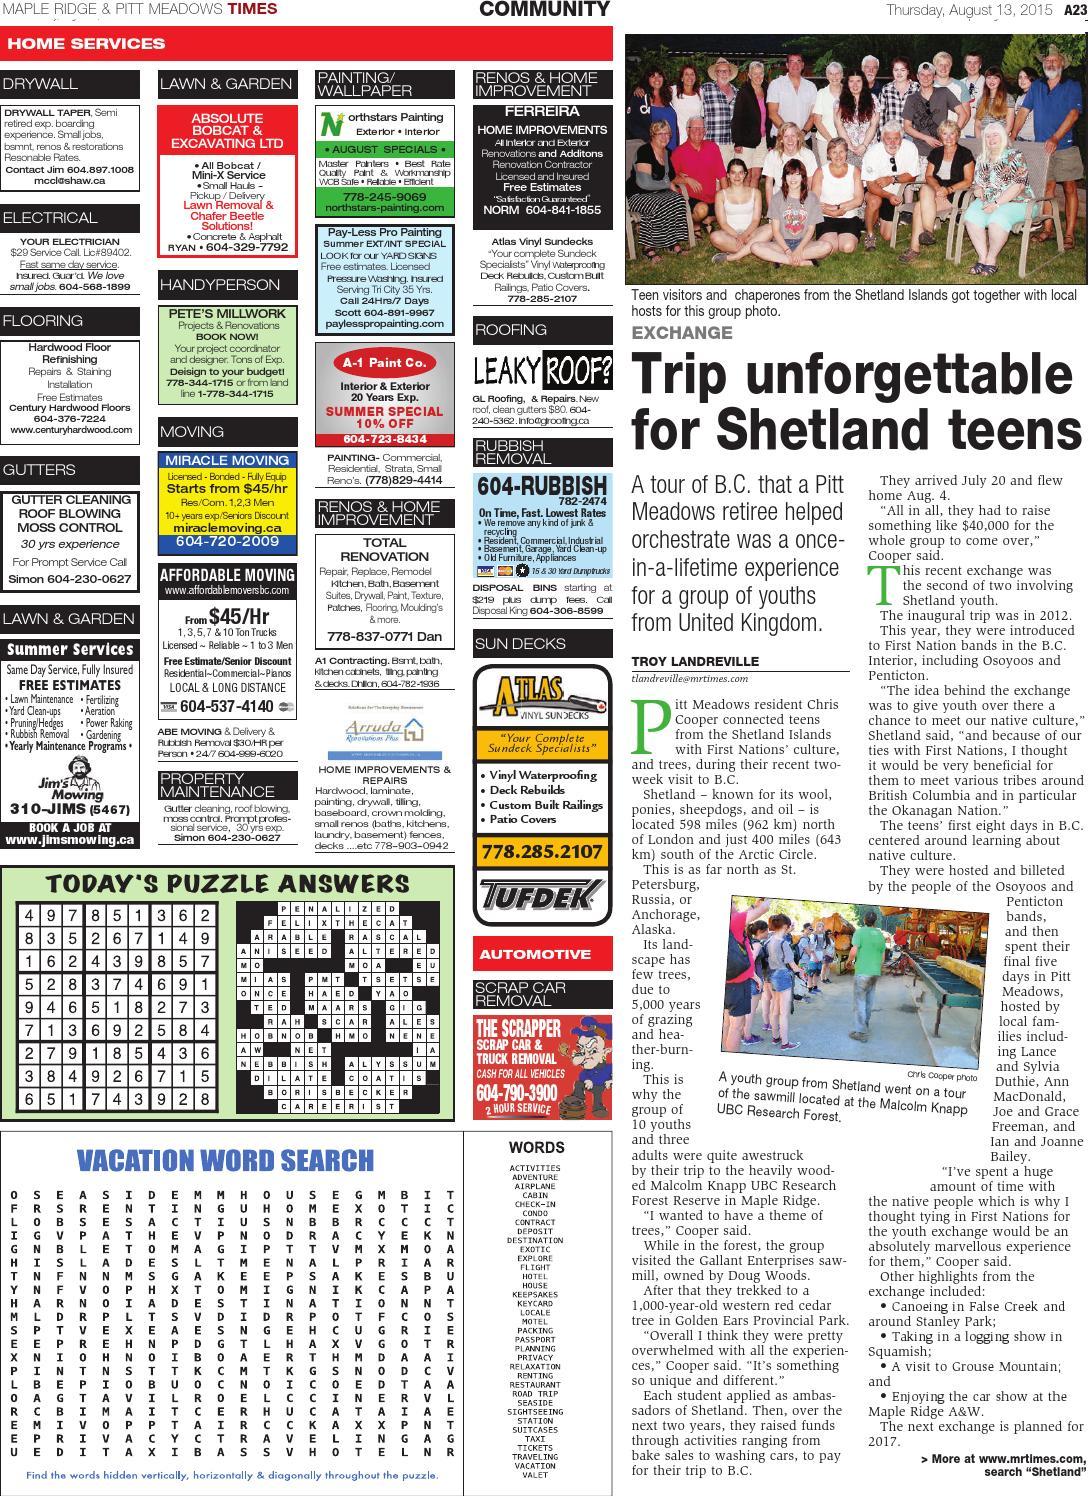 Maple Ridge-Pitt Meadows Times, August 13, 2015 by Black